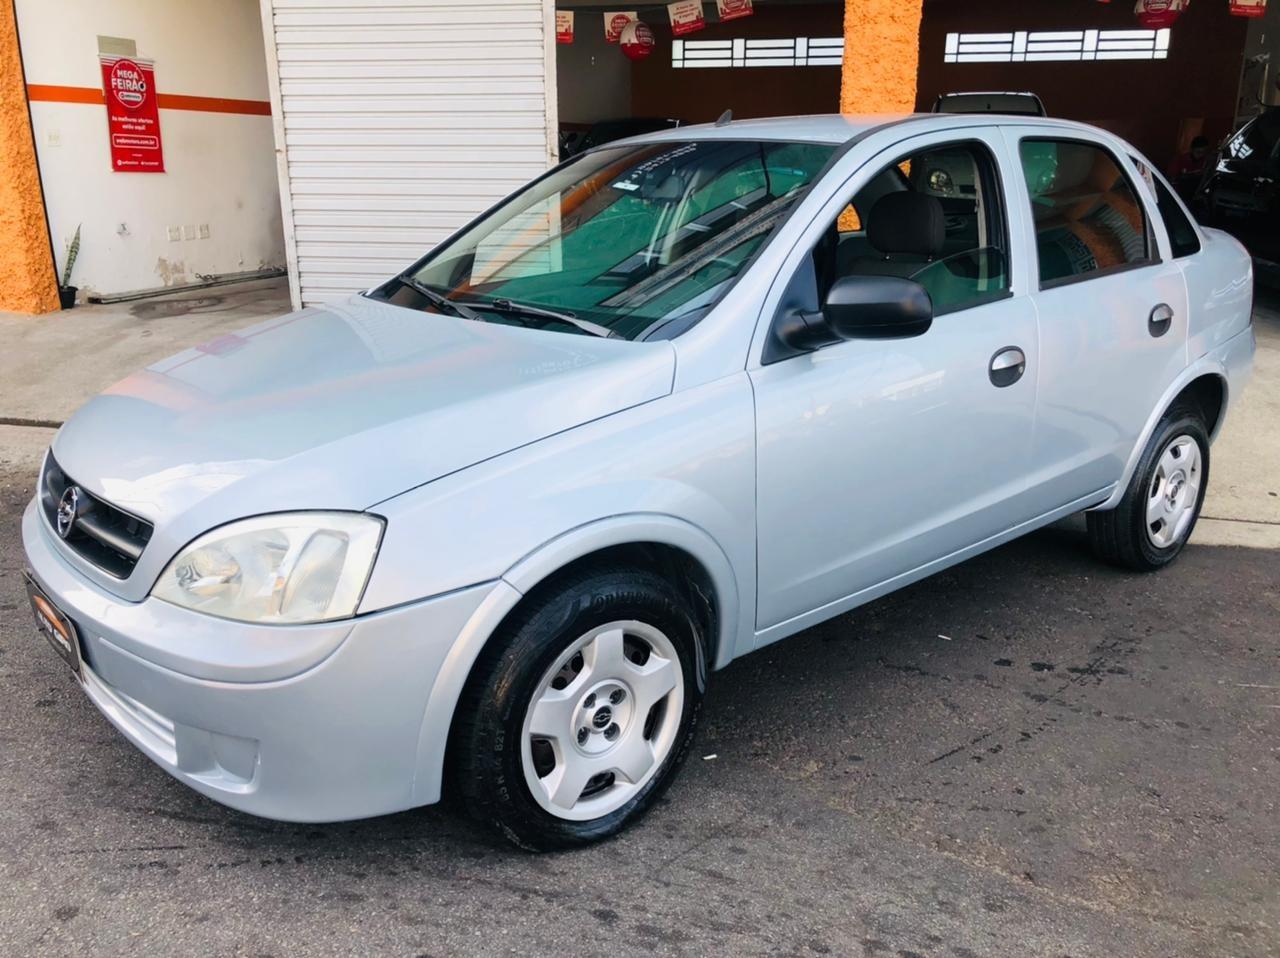 //www.autoline.com.br/carro/chevrolet/corsa-18-sedan-joy-8v-flex-4p-manual/2007/braganca-paulista-sp/15695340